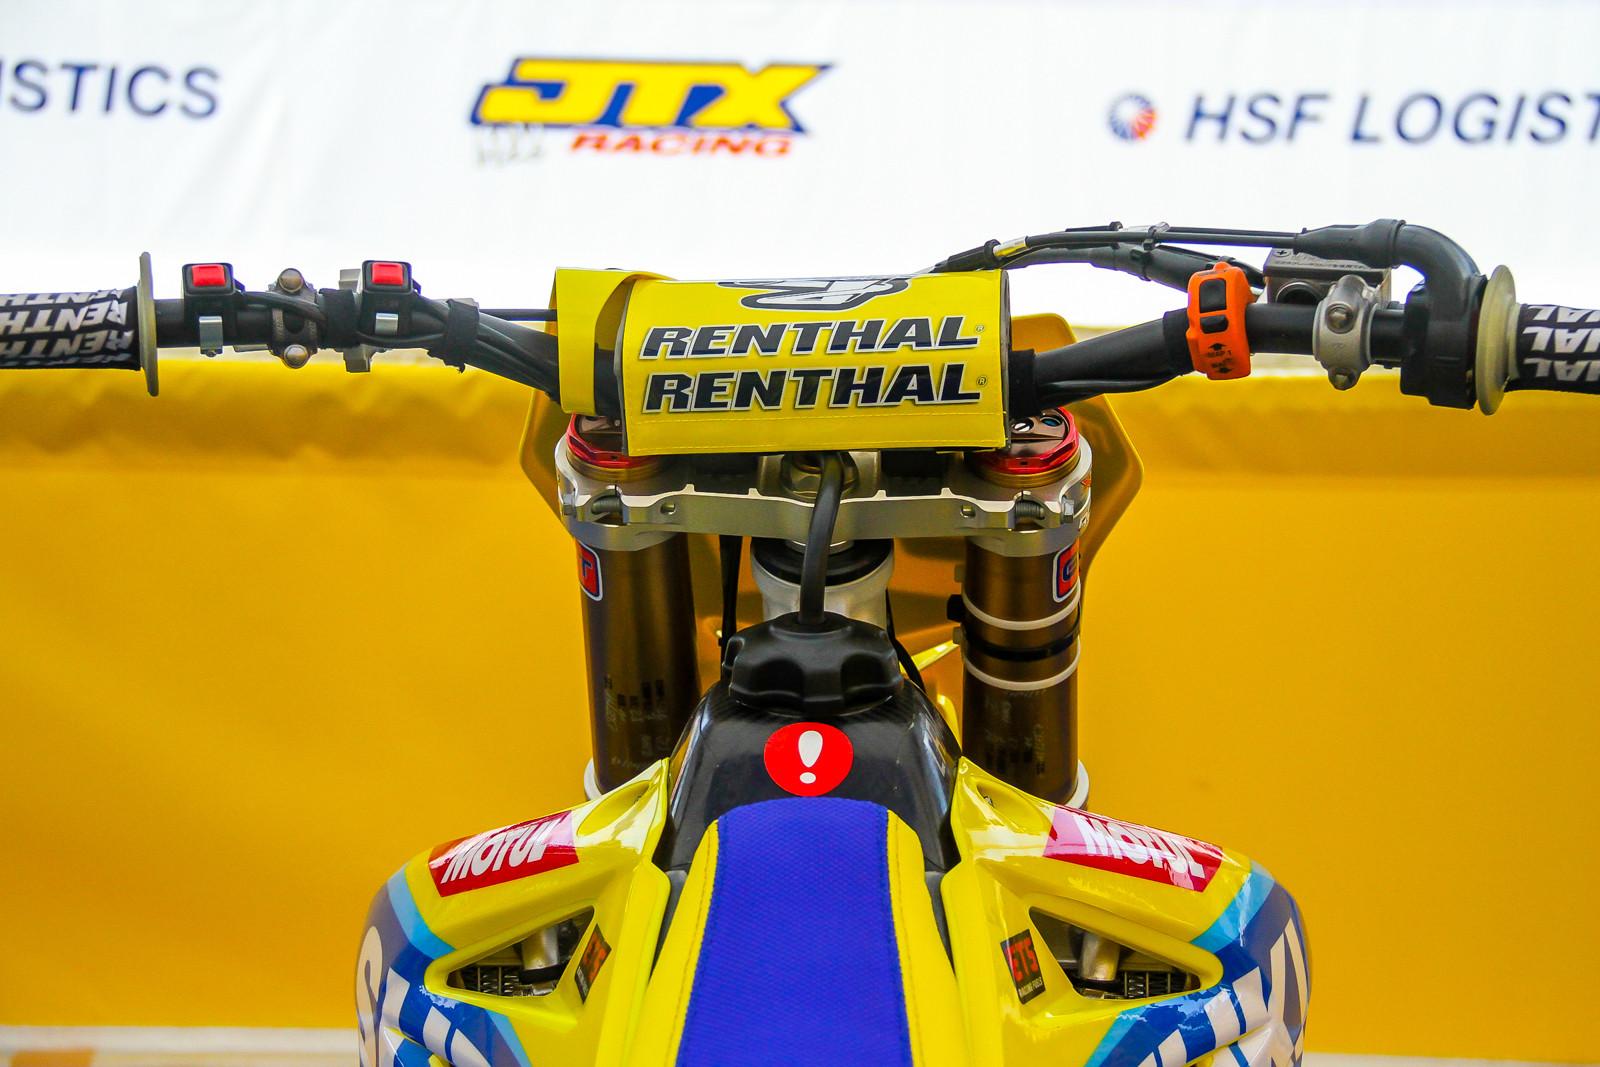 Suzuki World MXGP - Vital MX Pit Bits: 2017 MXGP of France - Motocross Pictures - Vital MX